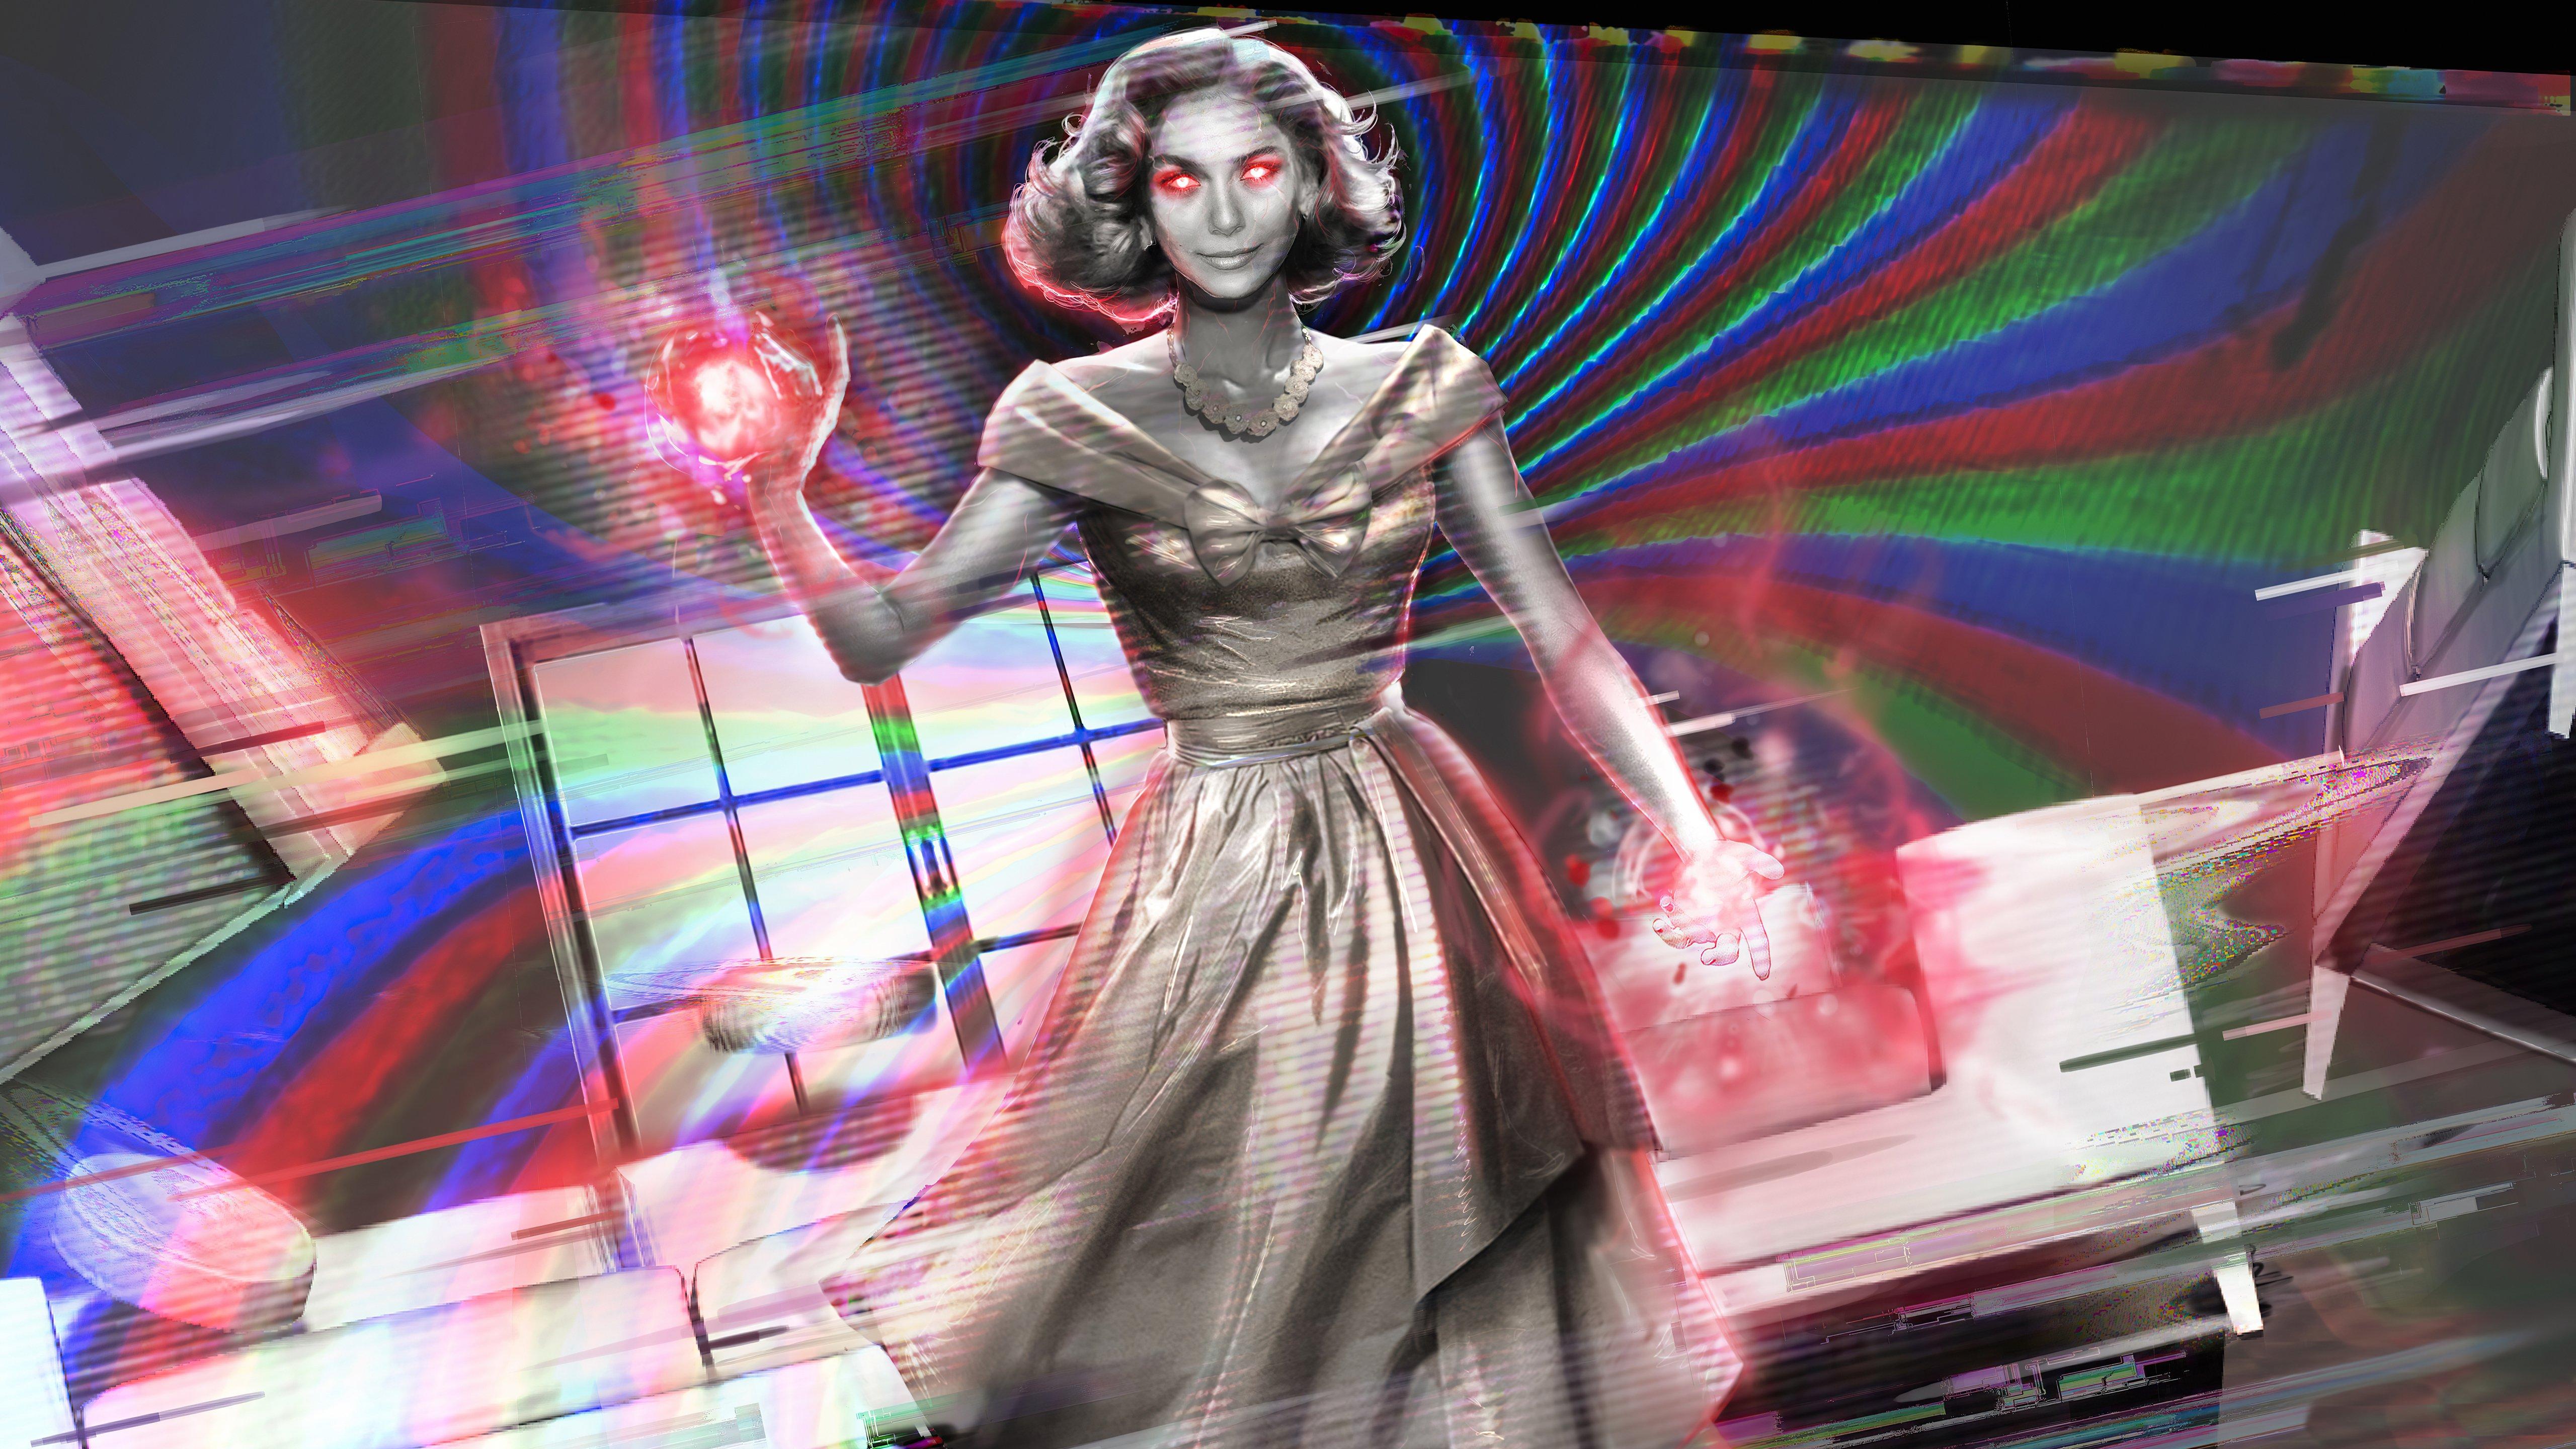 Fondos de pantalla Los poderes de Wanda